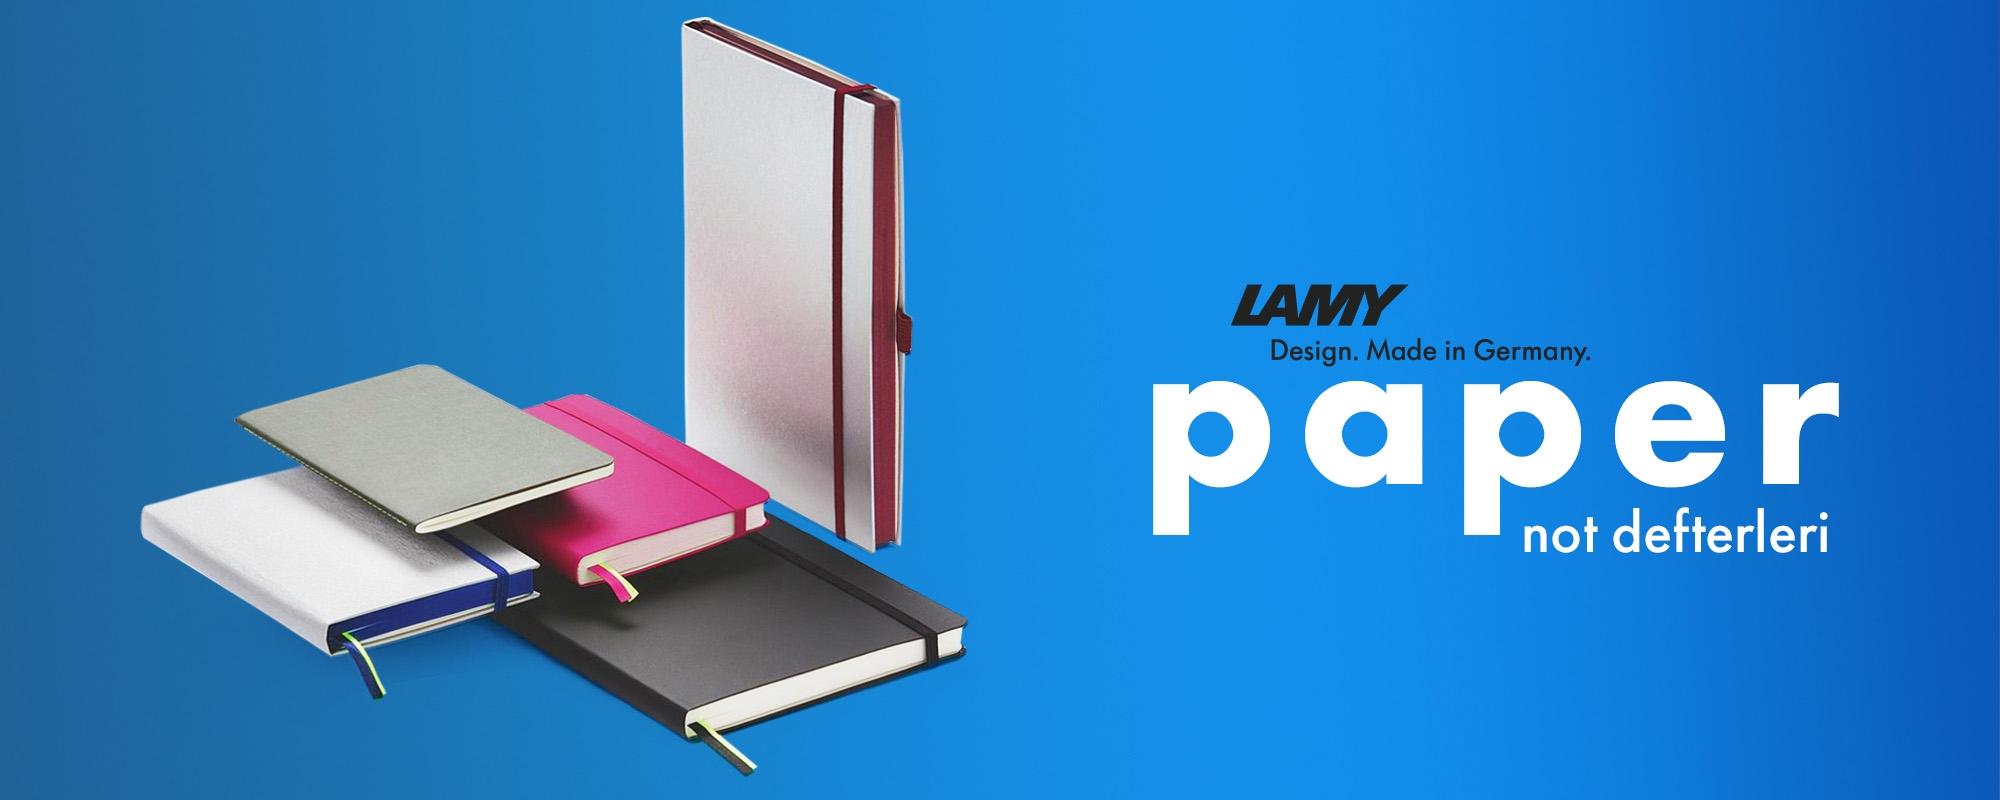 LAMY paper